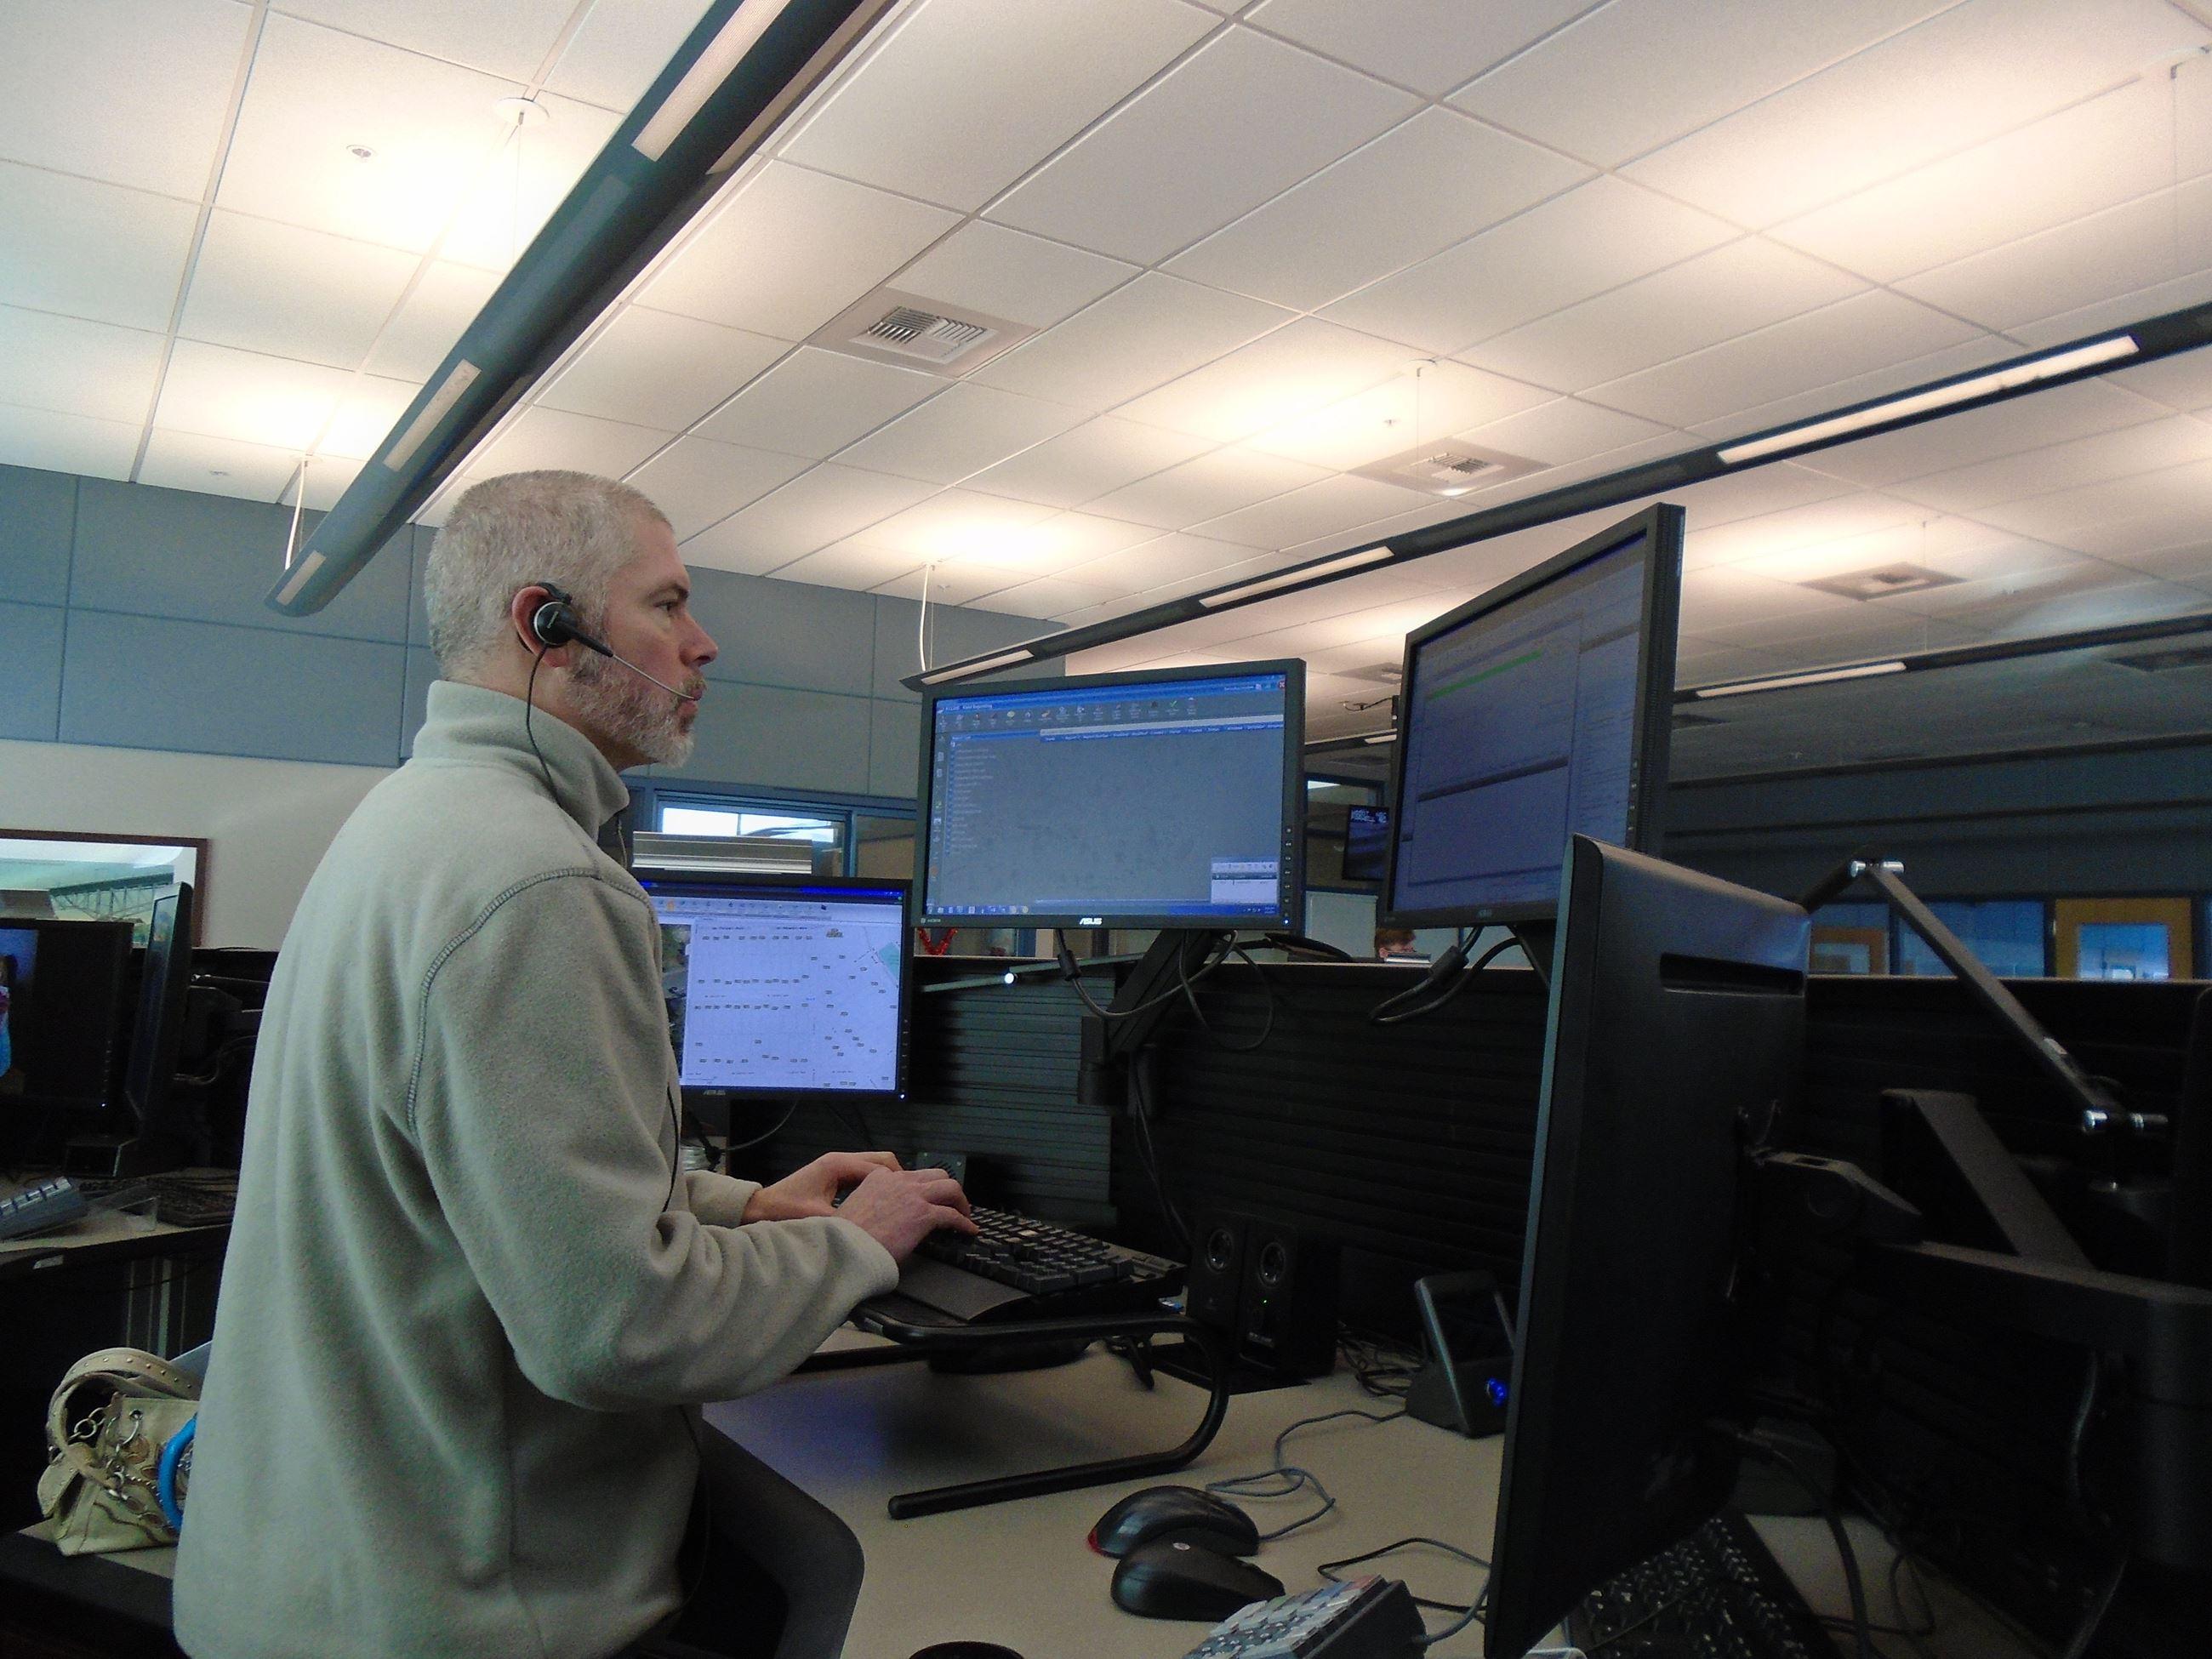 employment spokane county wa taking calls 4